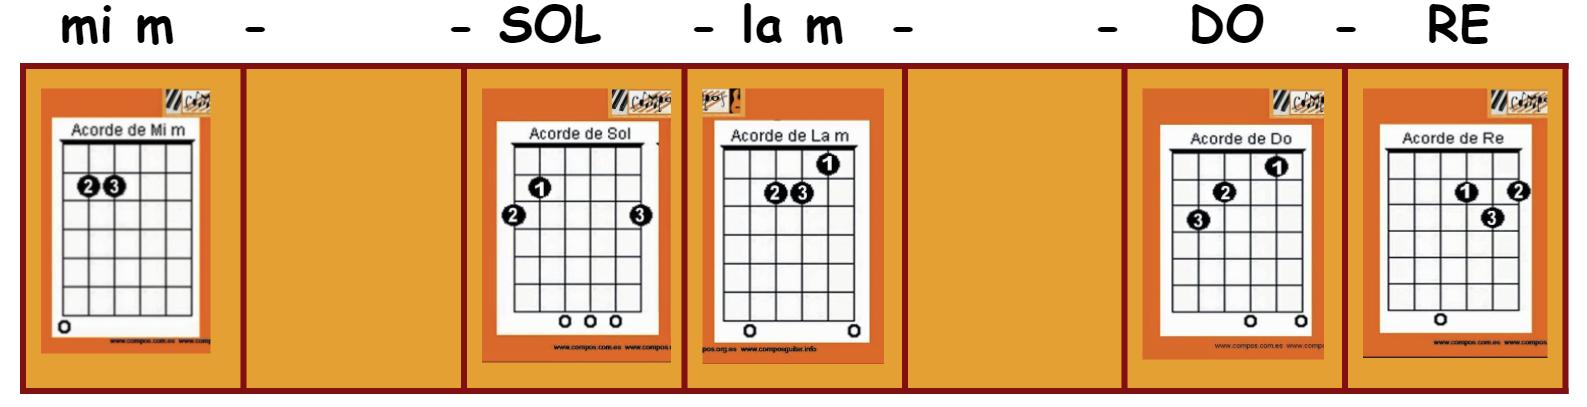 01-05 - SOL-lam DO RE mim / mim - SOL lam - DO RE